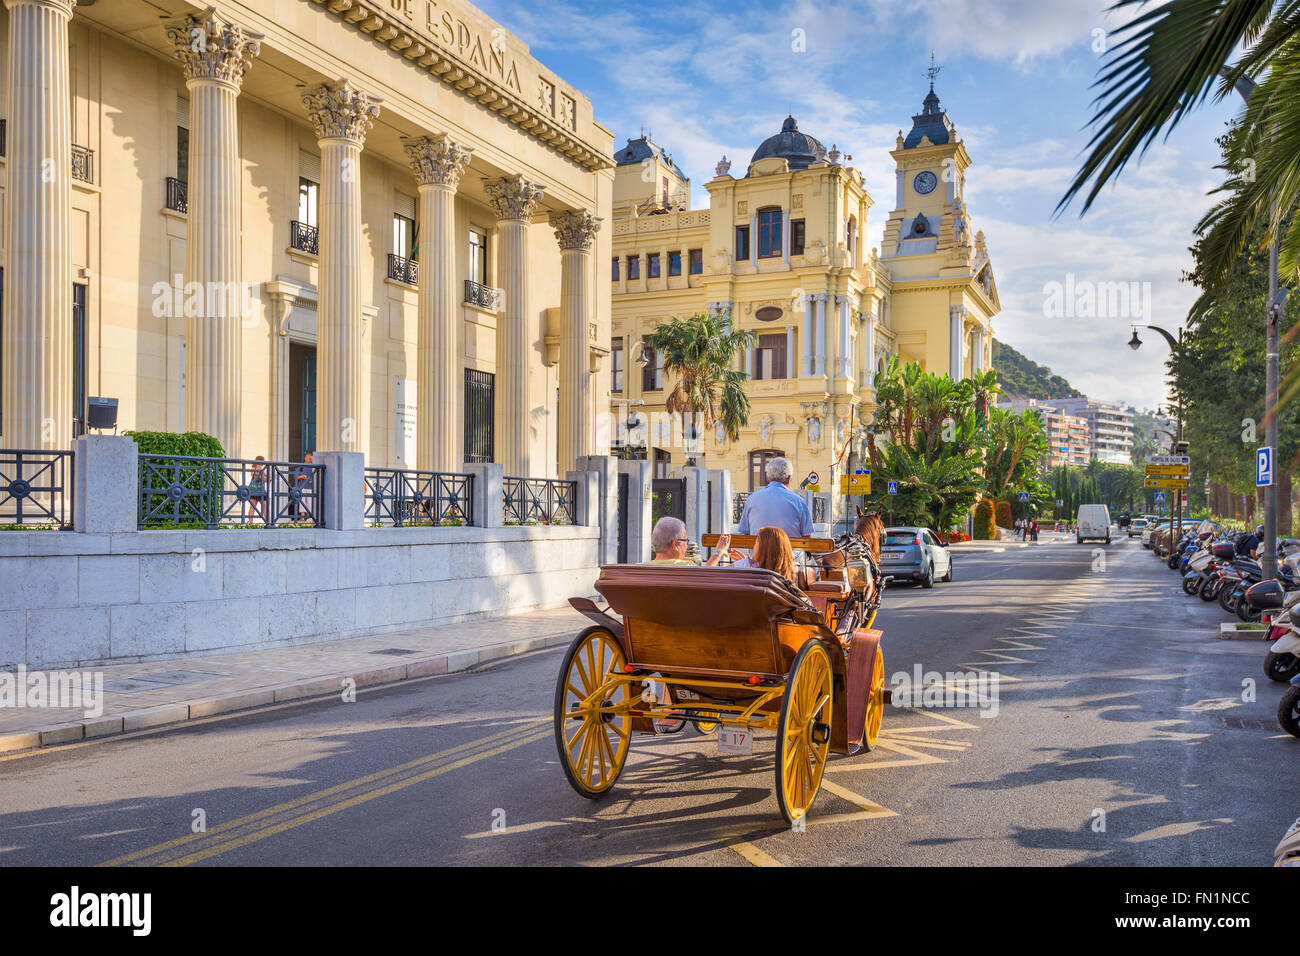 Malaga, Spain horse carriage and street scene. - Stock Image